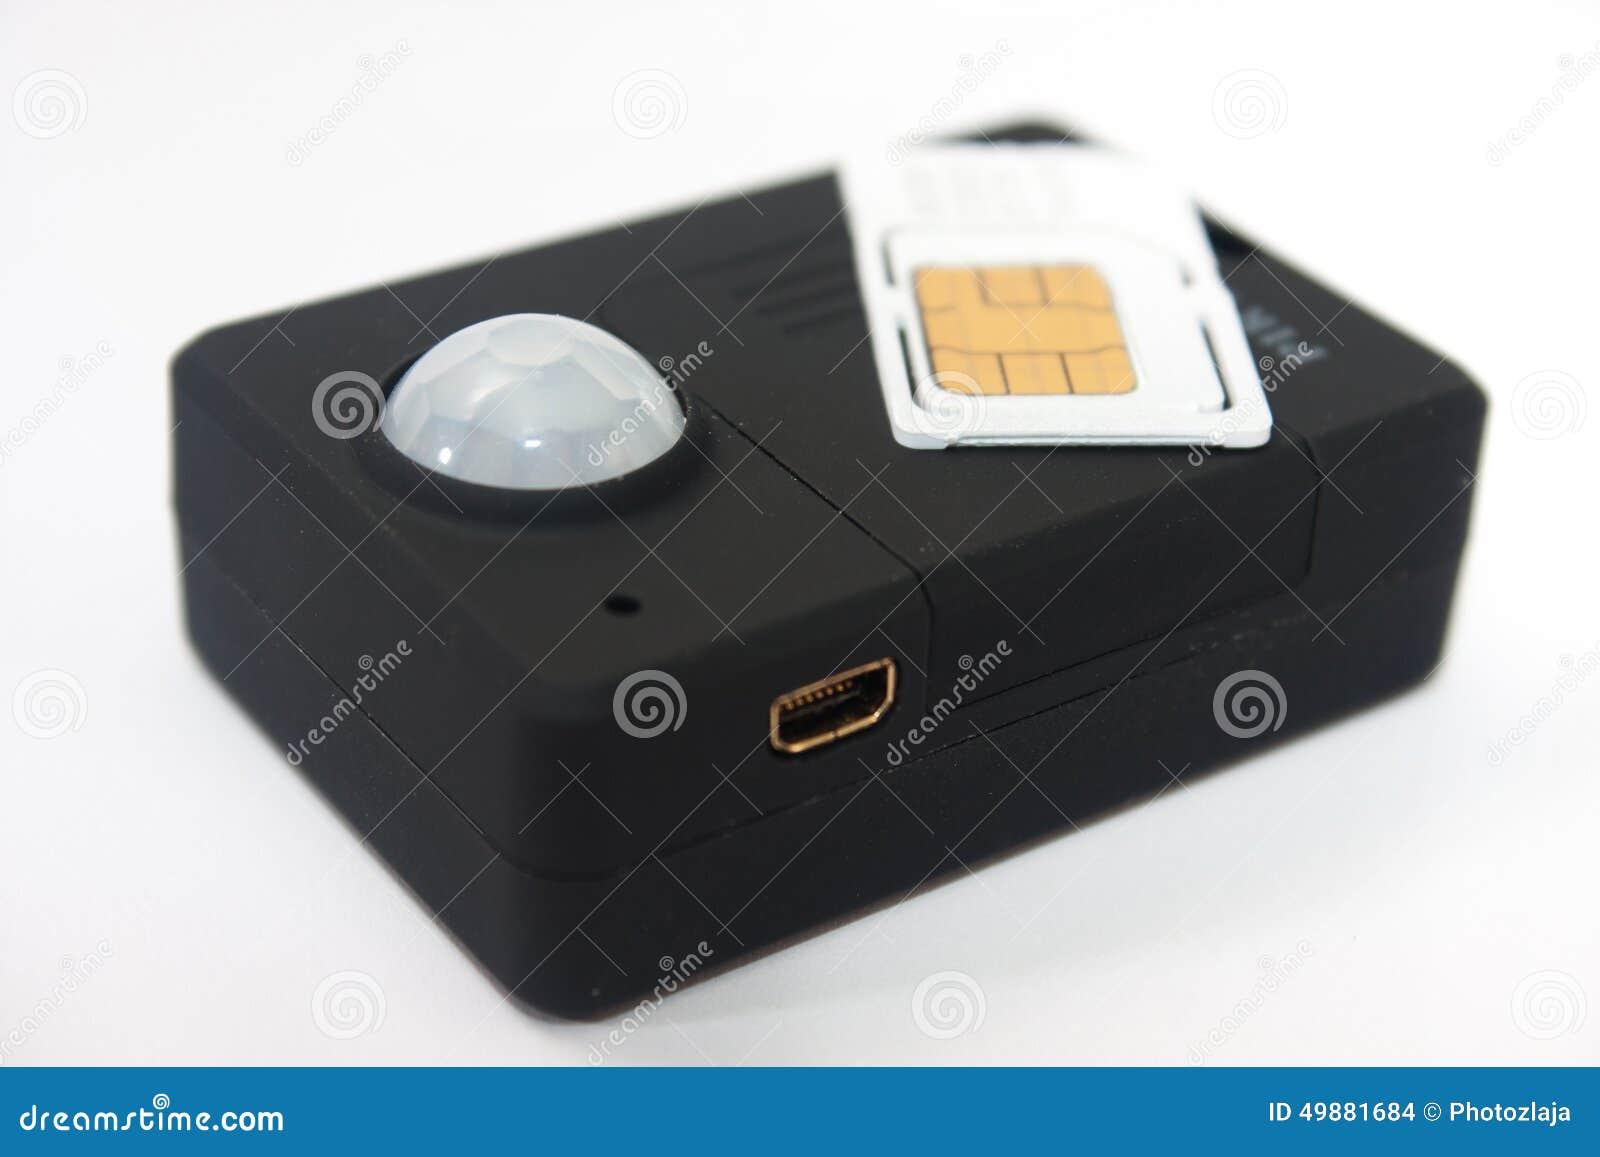 Gsm Pir Motion Detector Sensor Alarm With Sim Card Stock